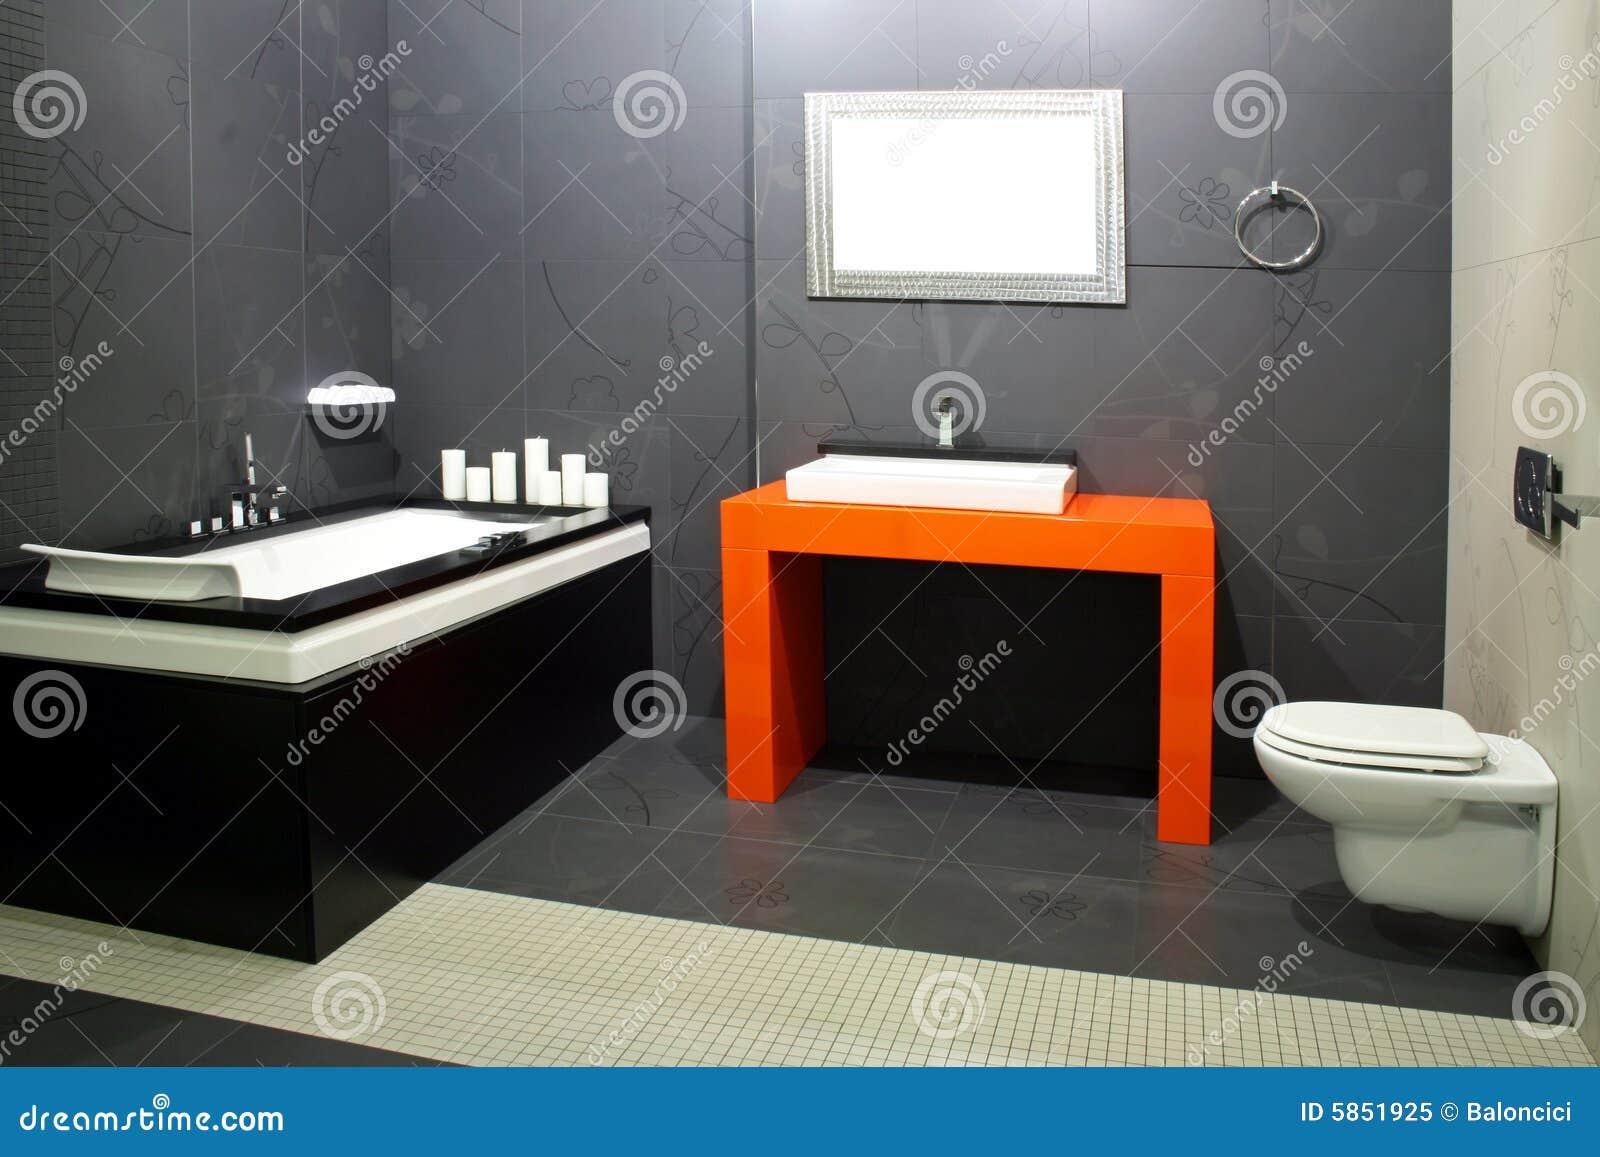 Schwarzes badezimmer 2 lizenzfreies stockfoto bild 5851925 - Schwarzes badezimmer ...